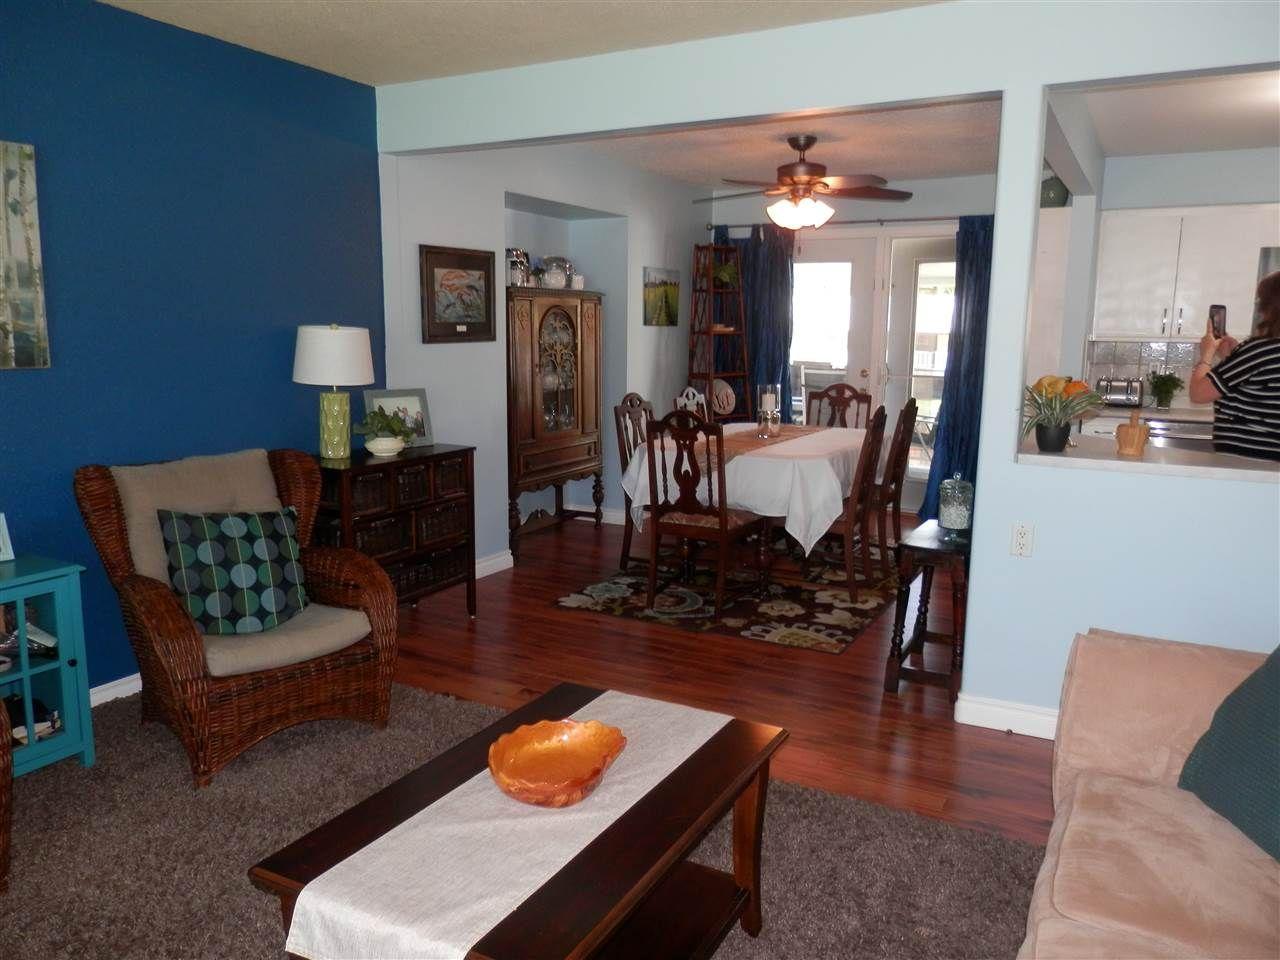 Photo 4: Photos: 783 PIGEON Avenue in Williams Lake: Williams Lake - City House for sale (Williams Lake (Zone 27))  : MLS®# R2459919